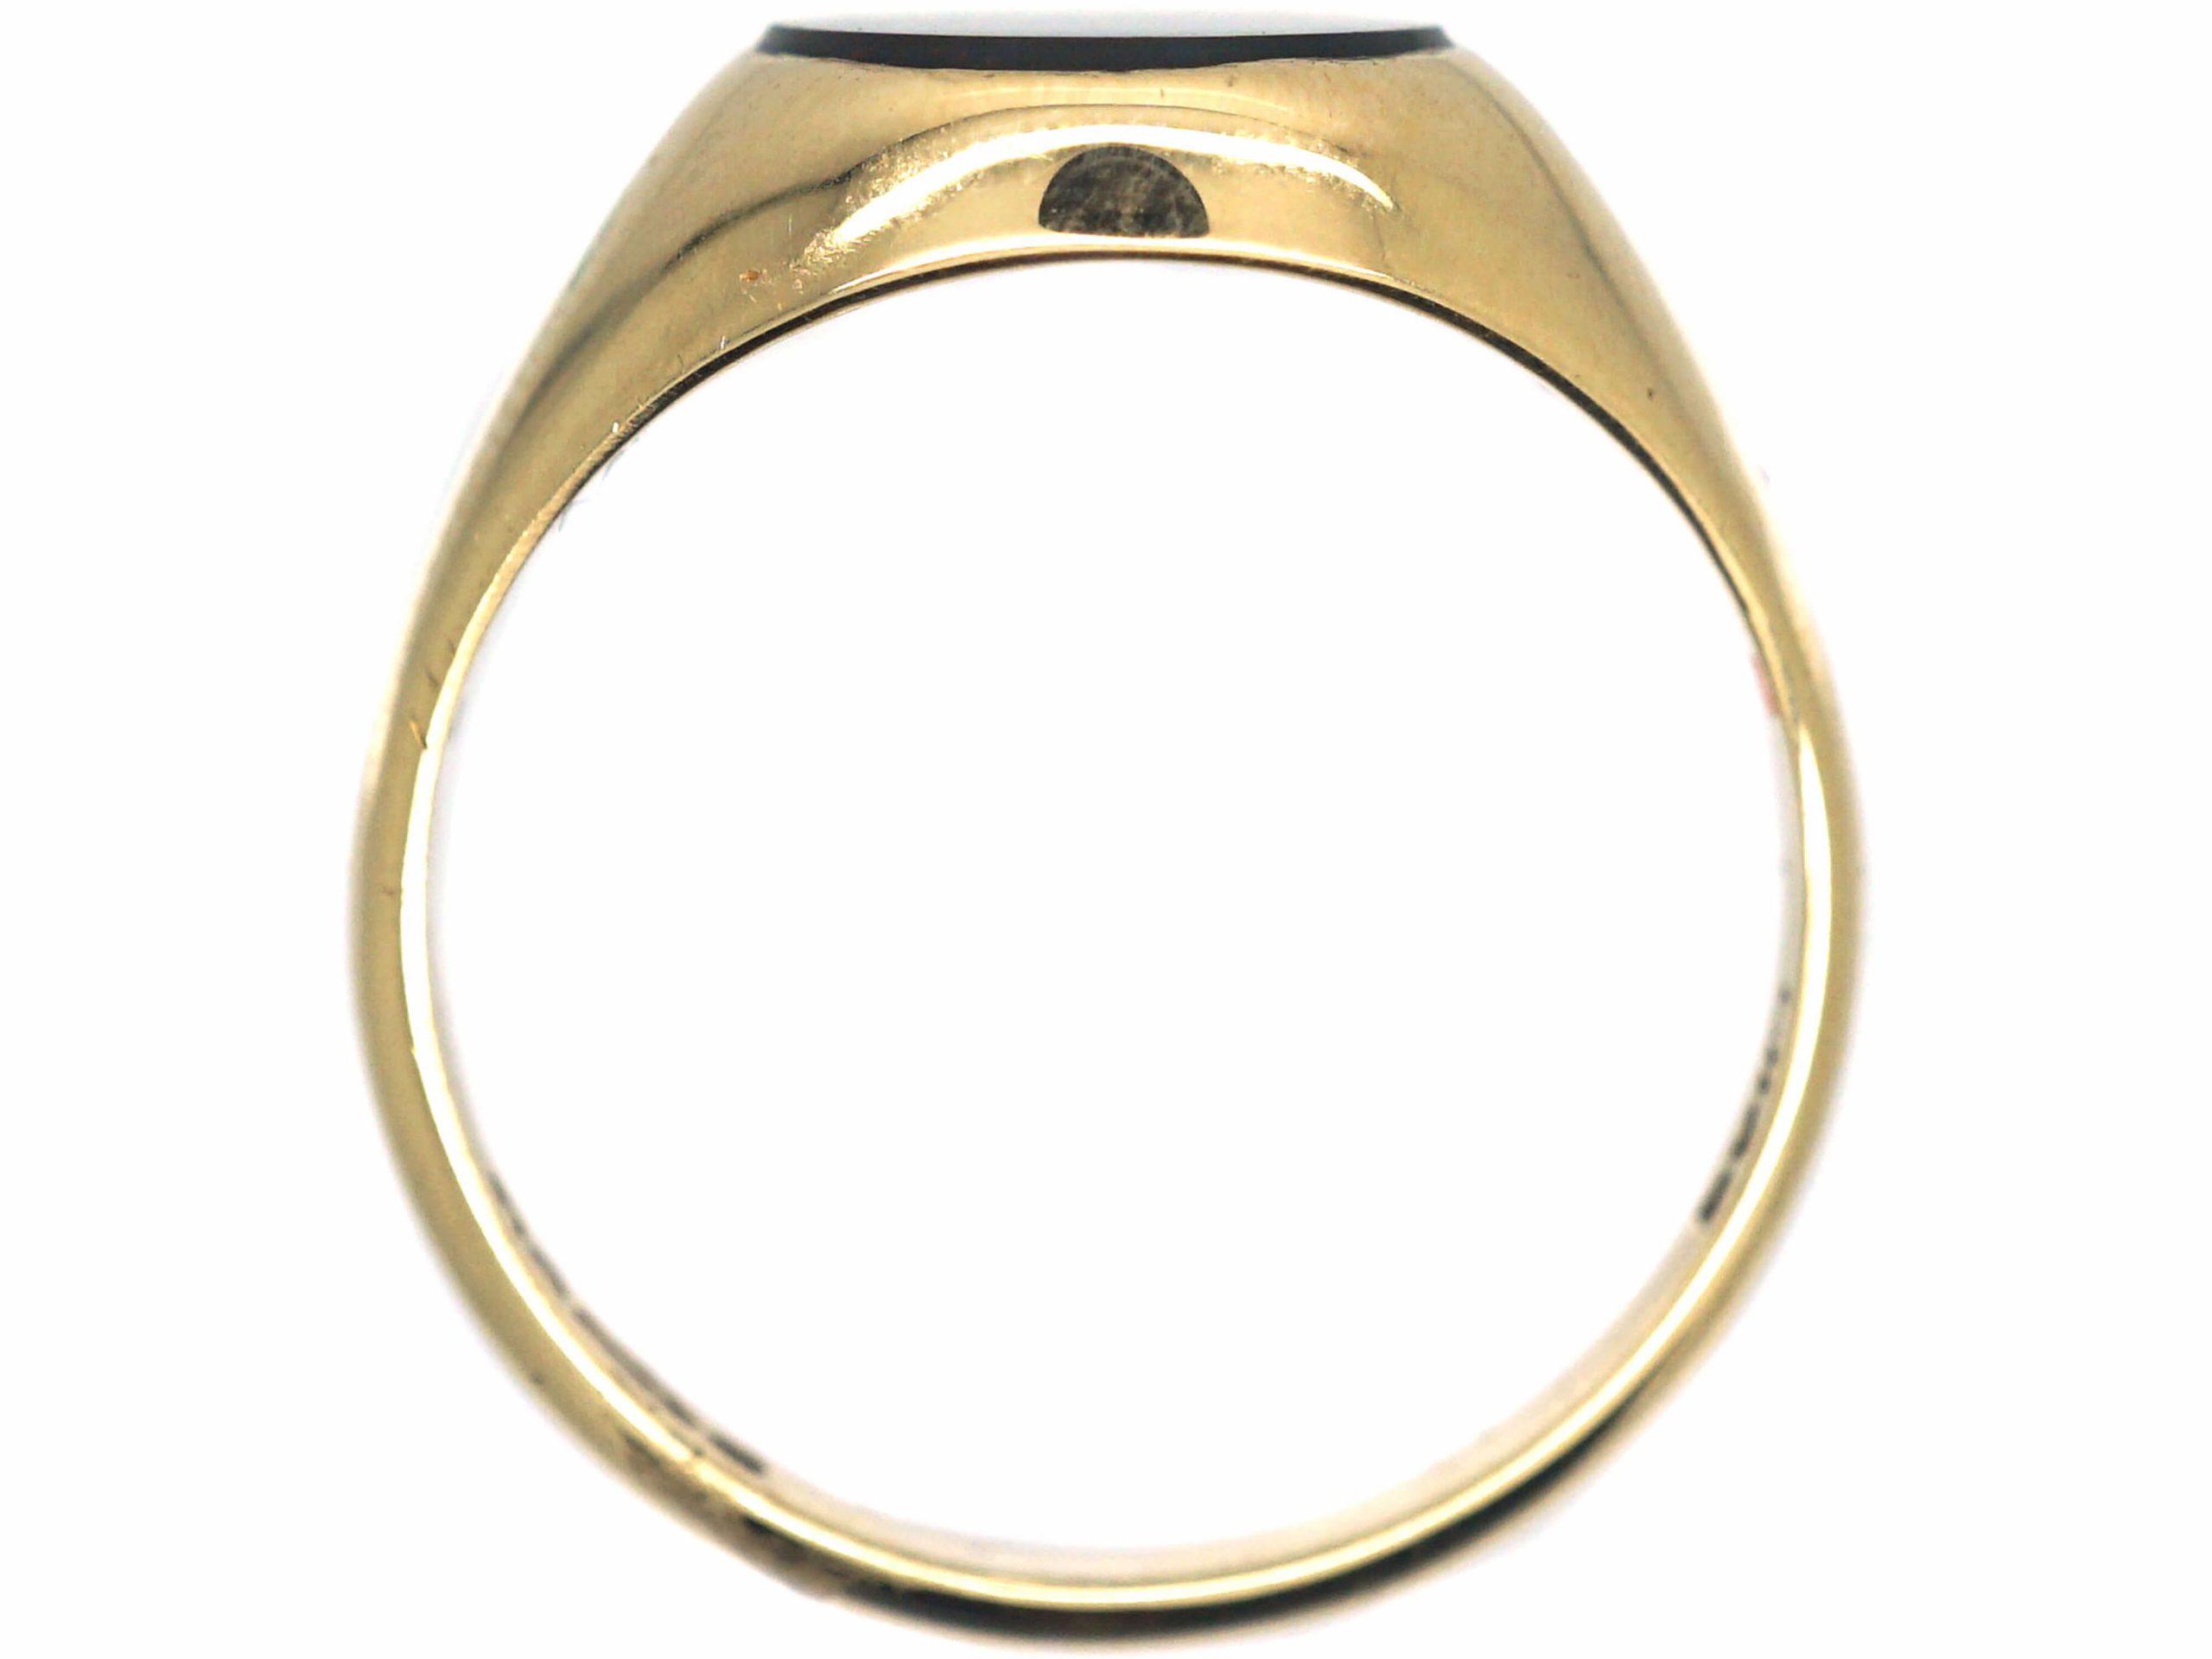 9ct Gold & Bloodstone Signet Ring